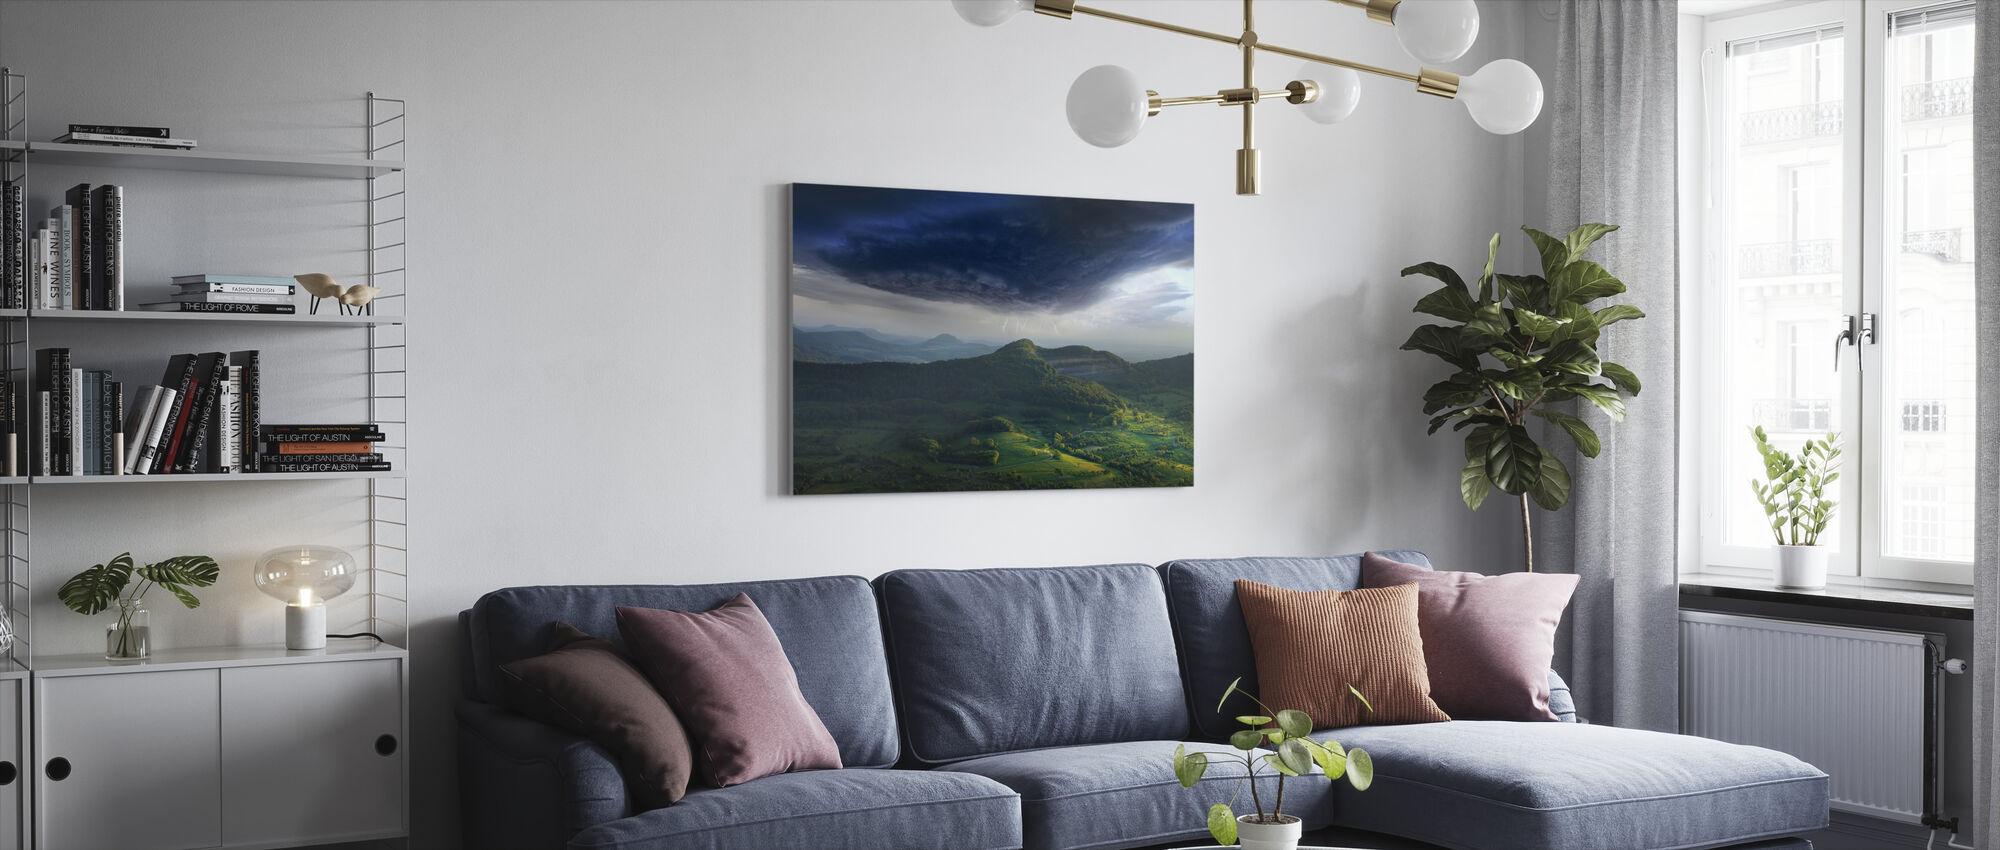 Green Landscape Thunderstorm - Canvas print - Living Room